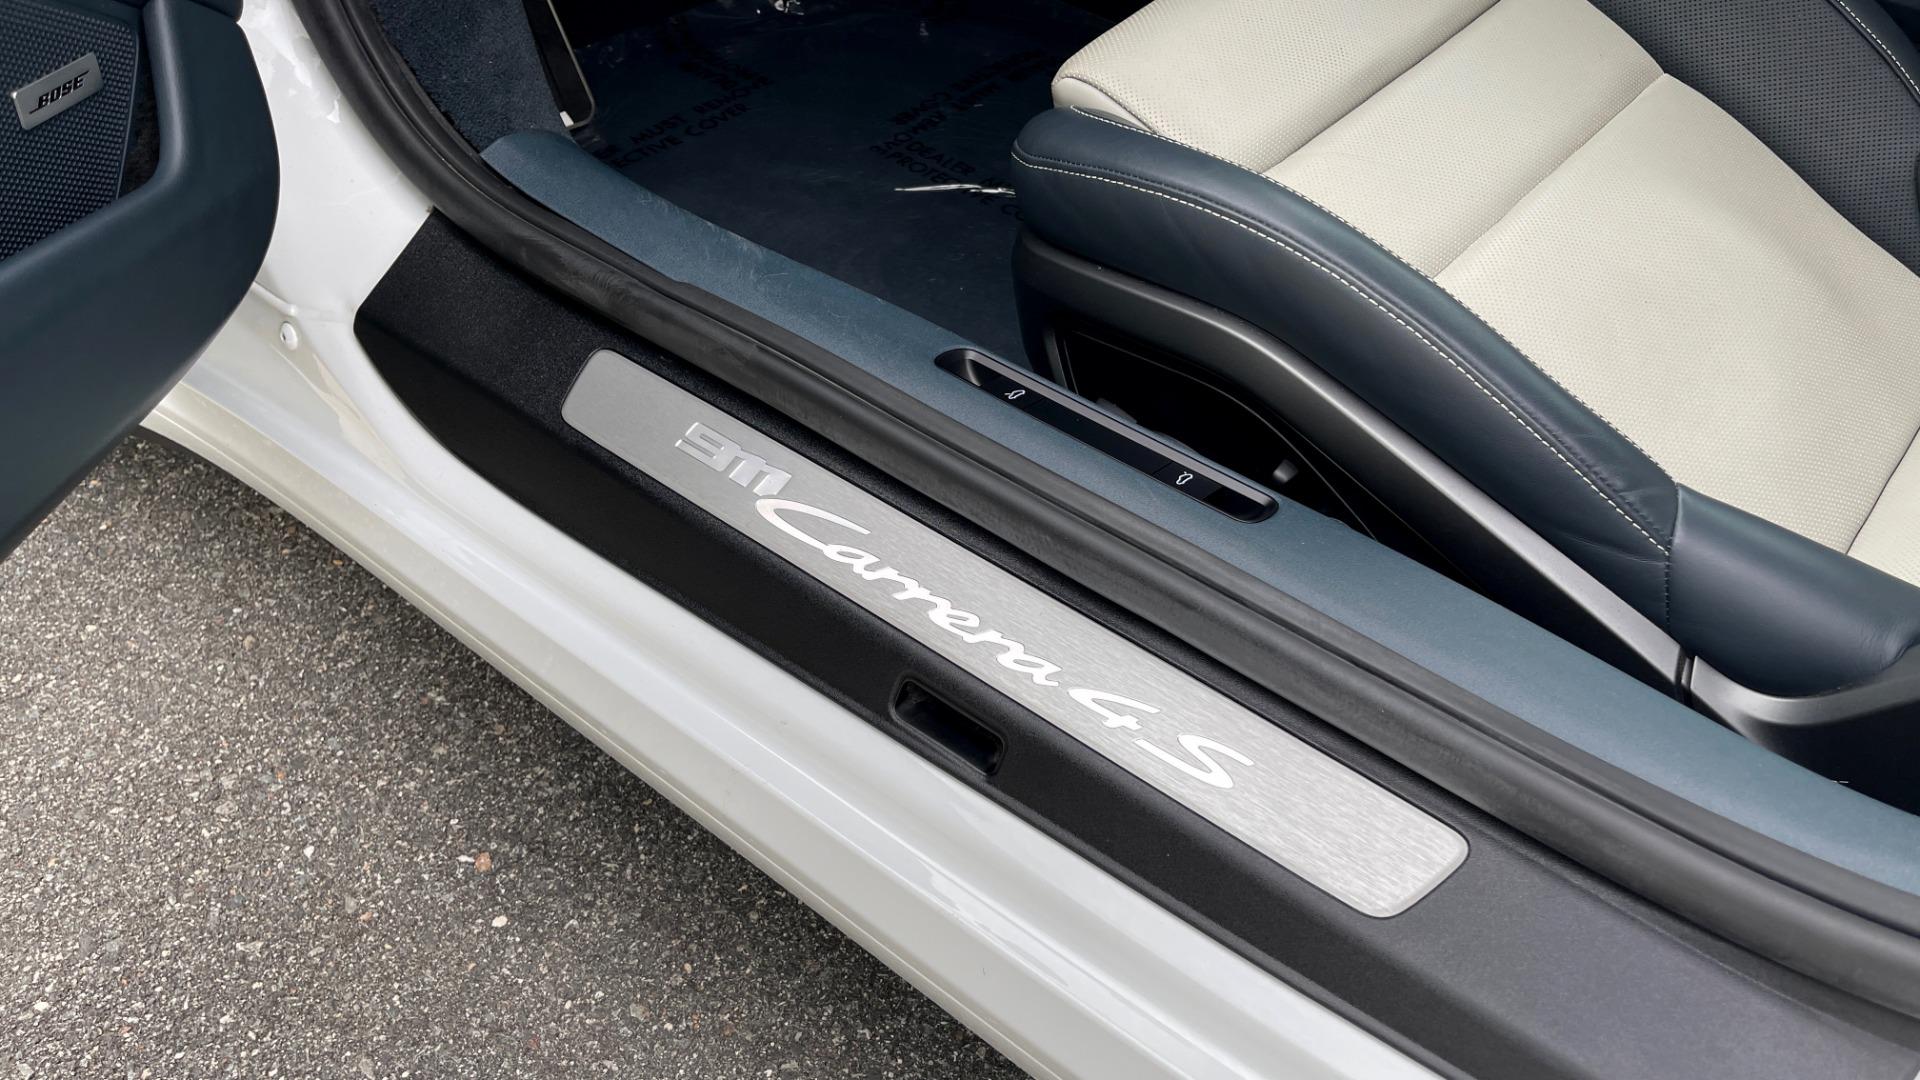 Used 2020 Porsche 911 CARRERA 4S CABRIOLET PREMIUM SPORT PKG / NAV / BOSE / LIGHT DESIGN PKG for sale $167,595 at Formula Imports in Charlotte NC 28227 41